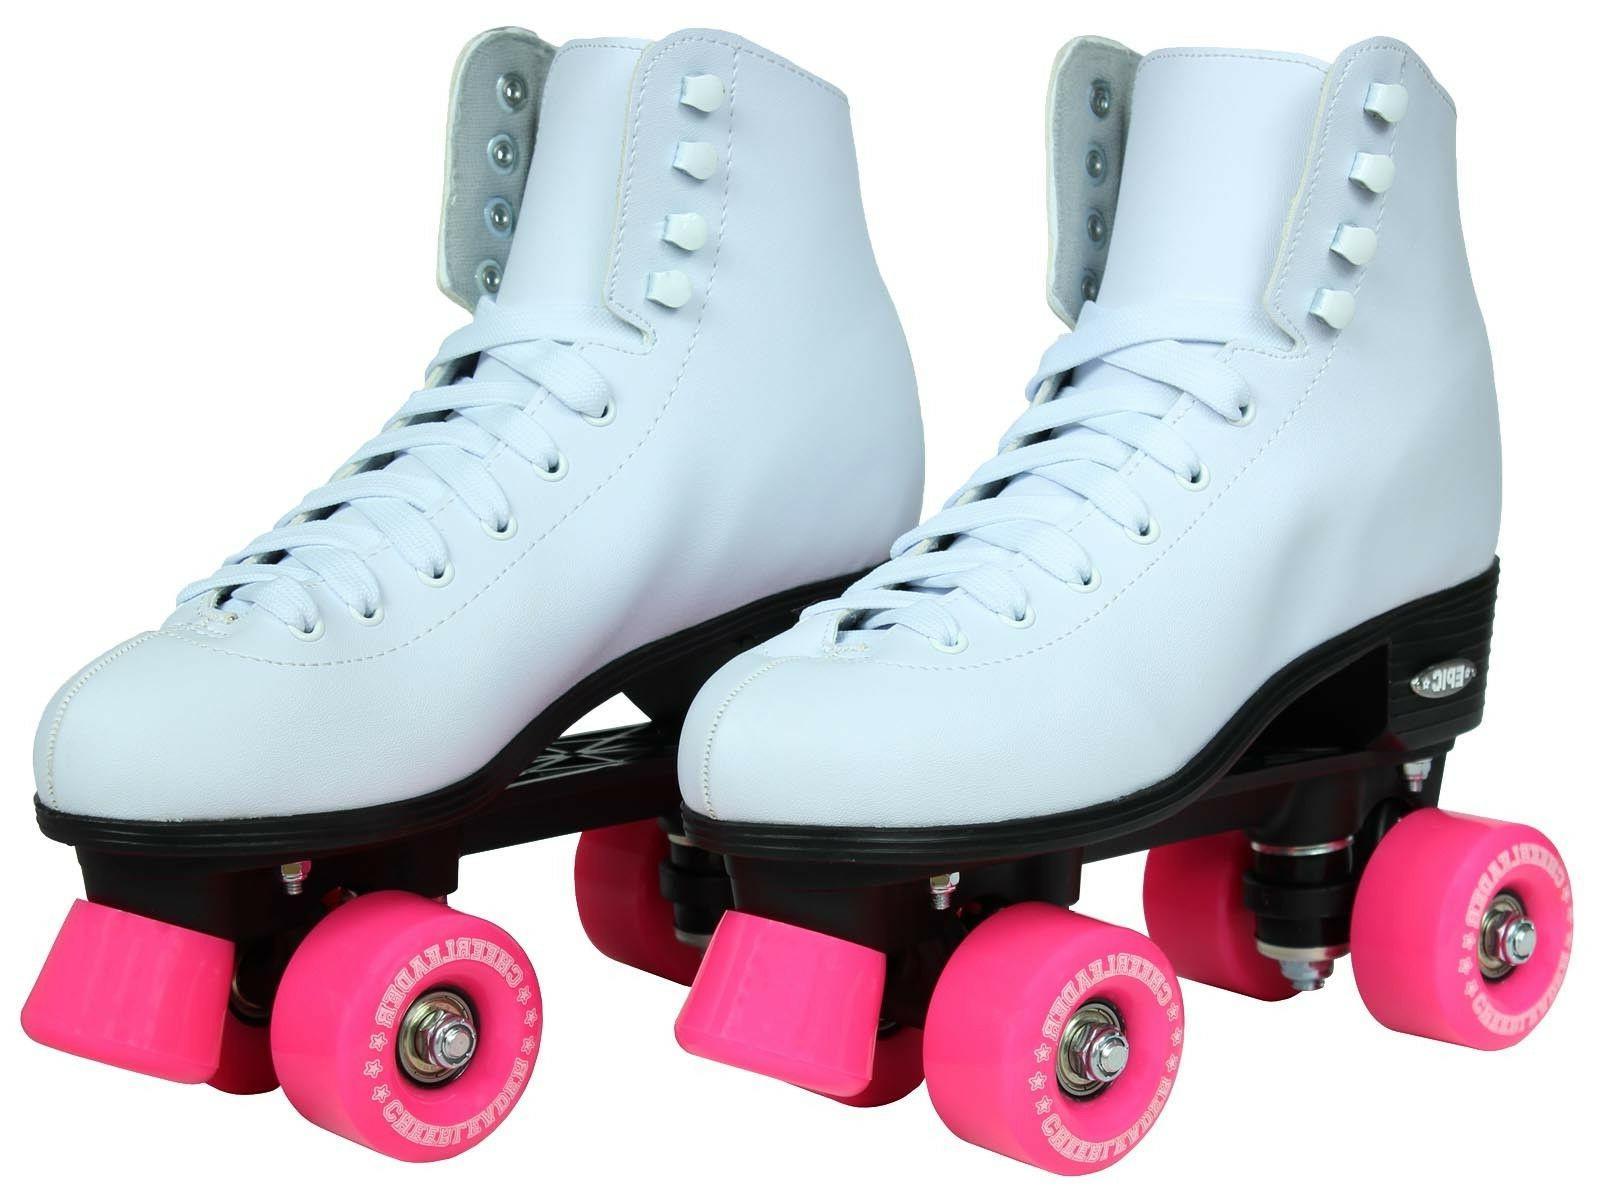 Epic White & Pink High-Top Quad Skates